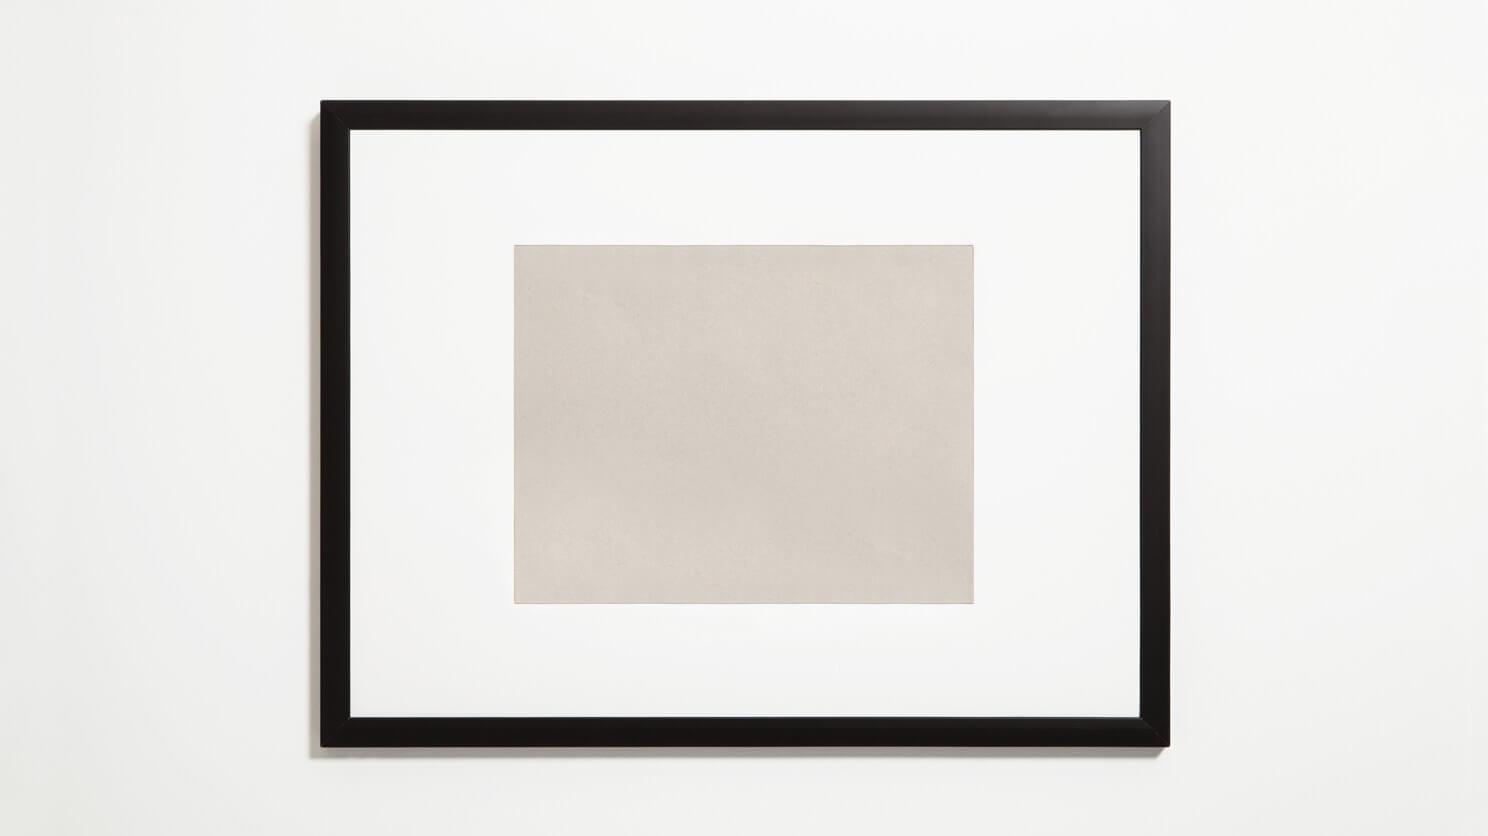 border picture frame large